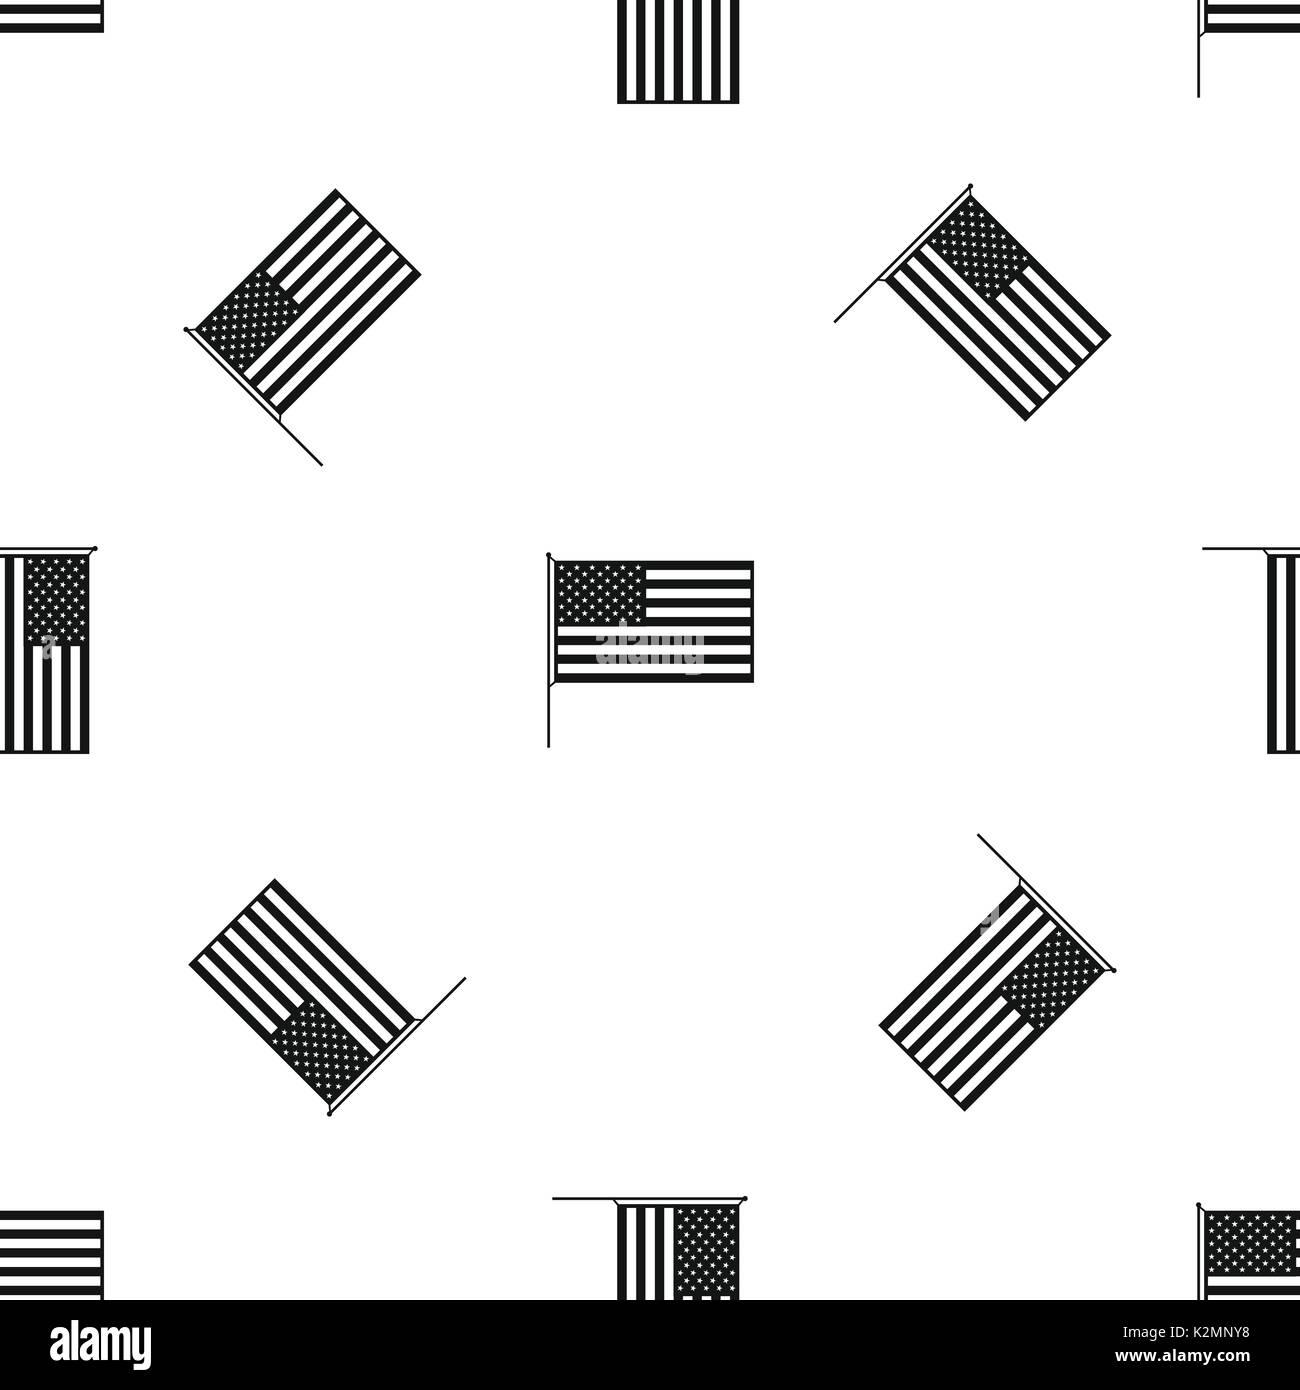 American Flag Pattern Seamless Black Stock Vector Art Illustration